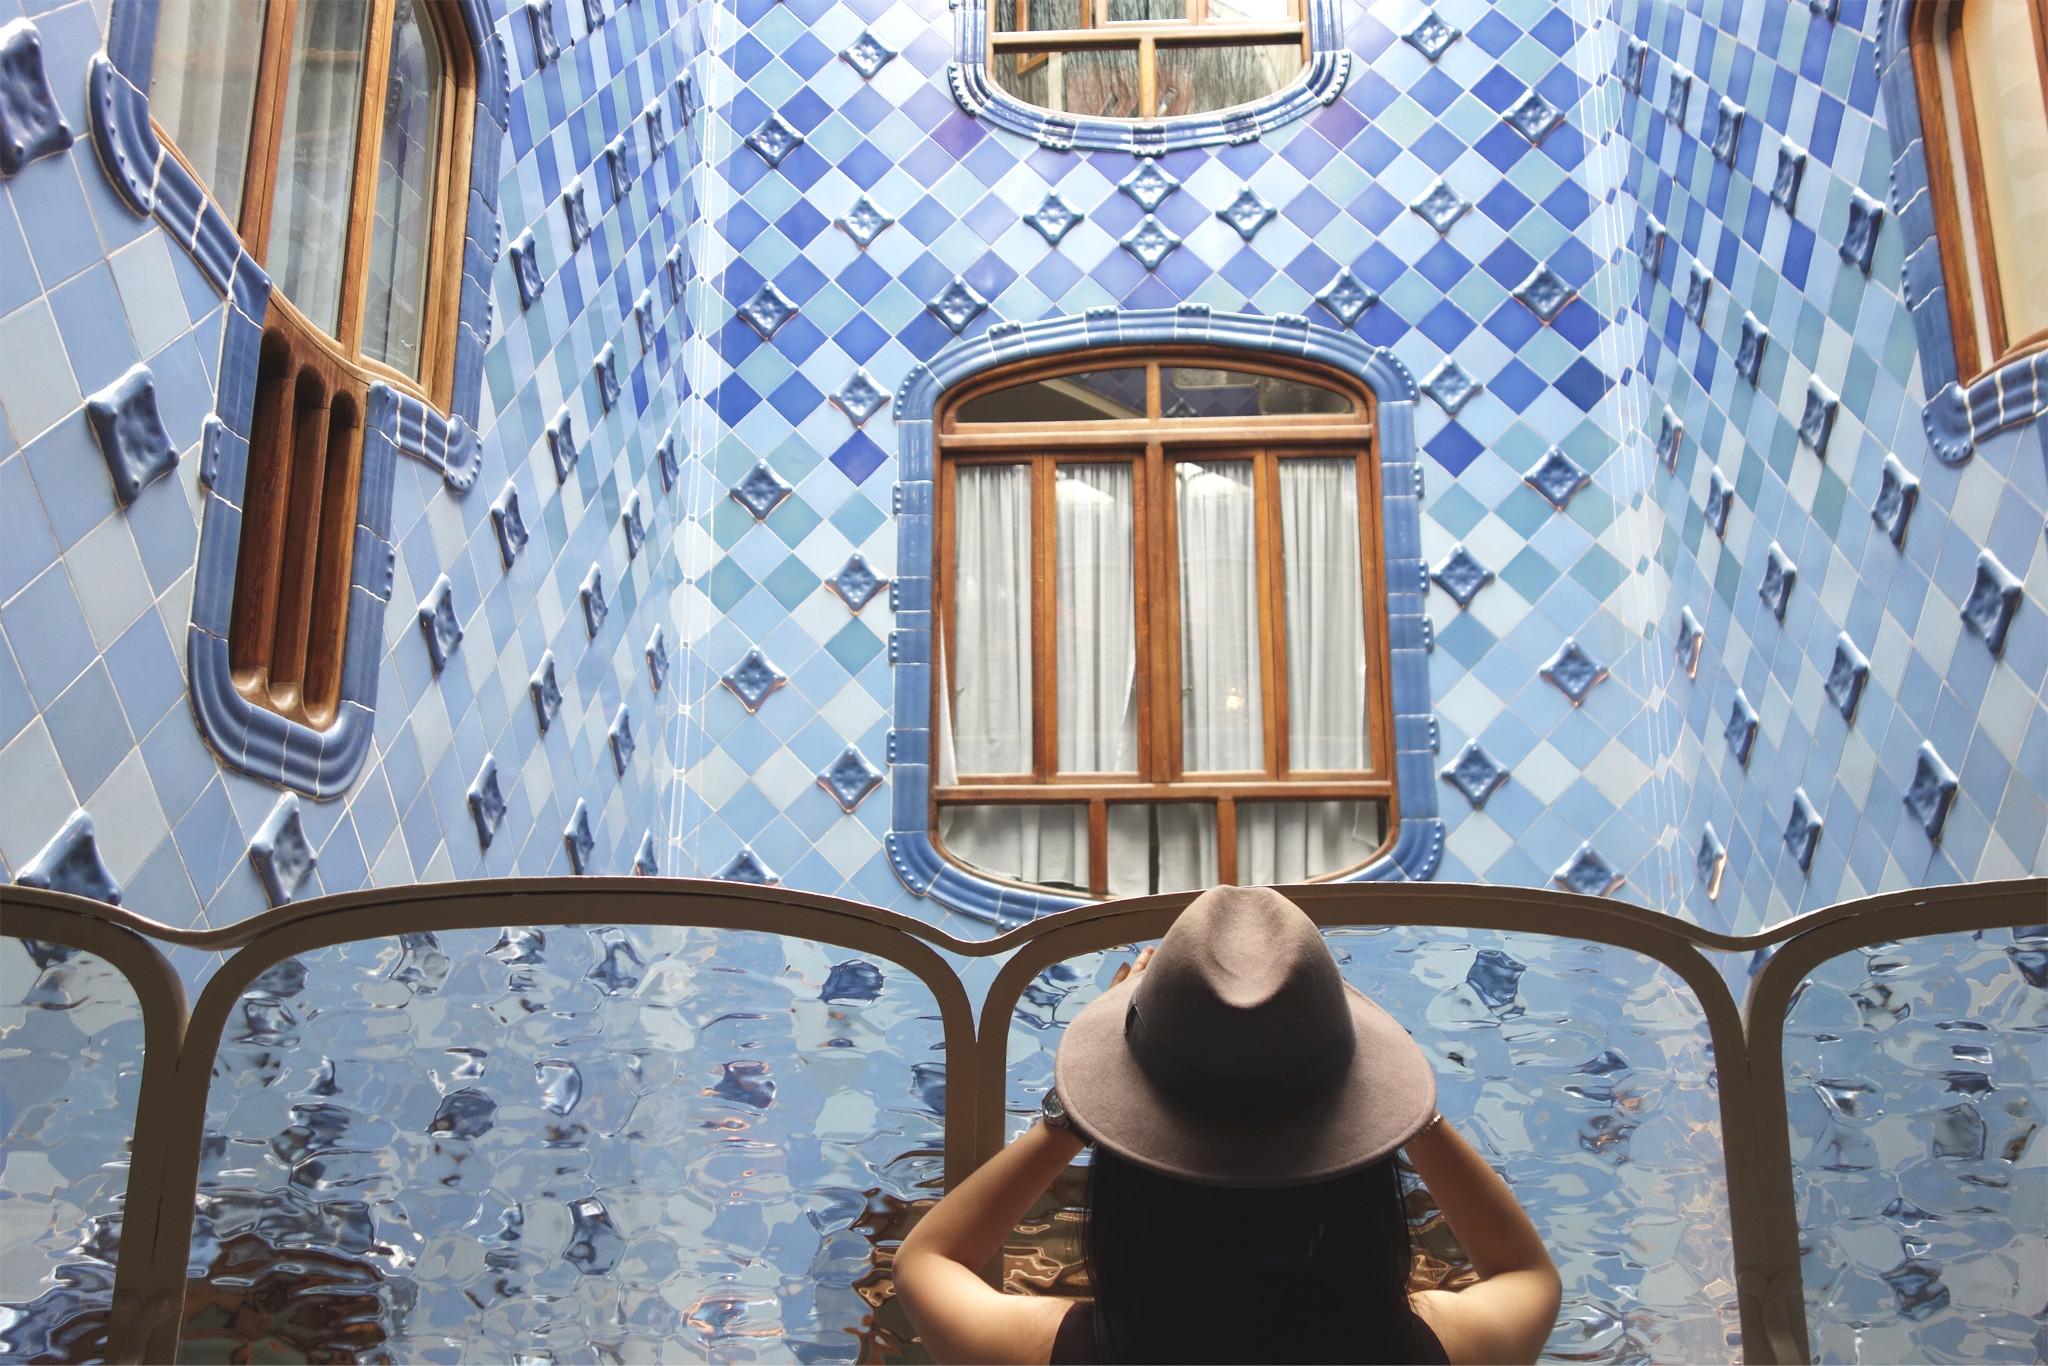 L'intérieur de la Casa Batlló